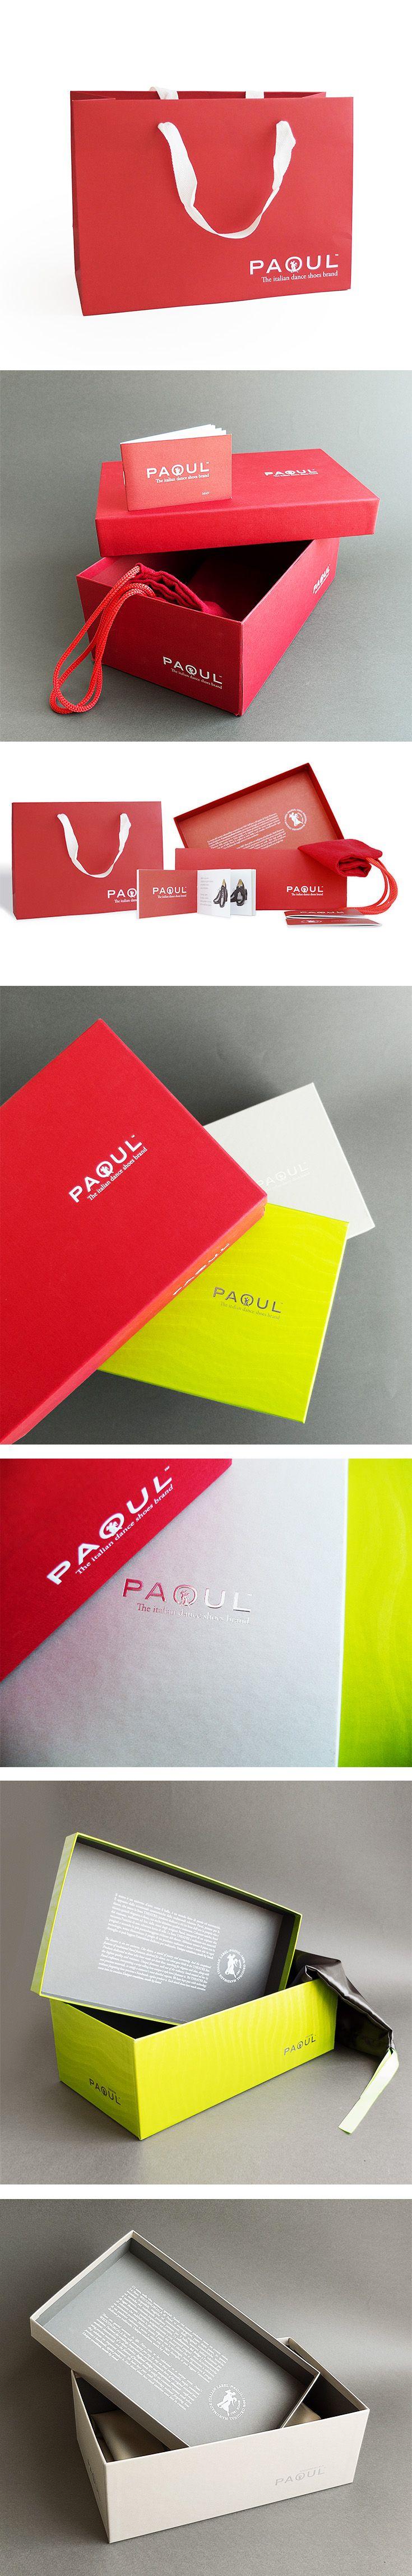 Packaging per Paoul, un progetto #effADV - Paoul packaging, effADV project - #packaging #shopper #shoebox #shoes #box